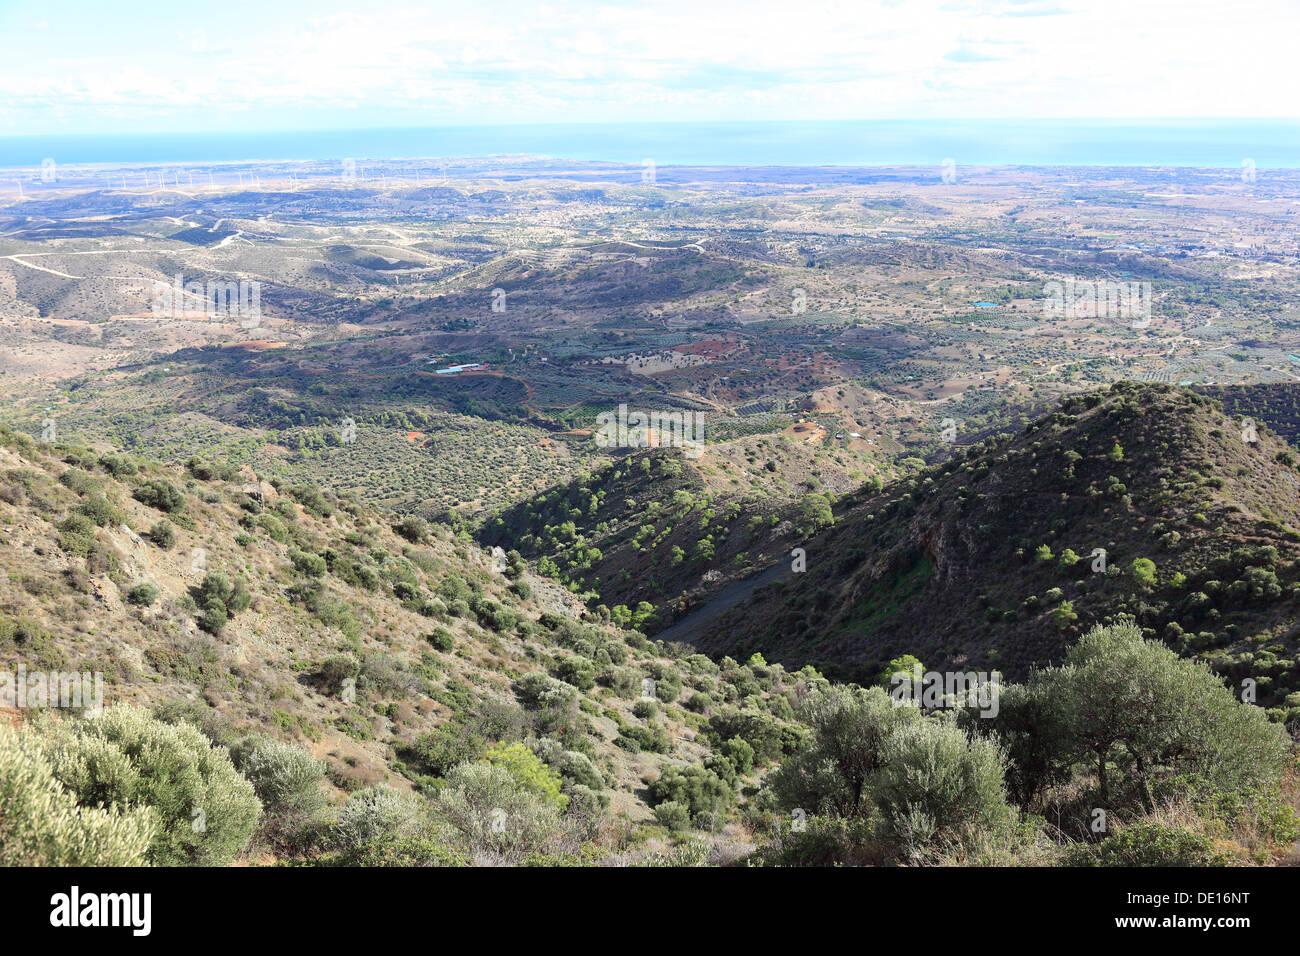 Cyprus, mountainous, hilly landscape at Pyrga - Stock Image